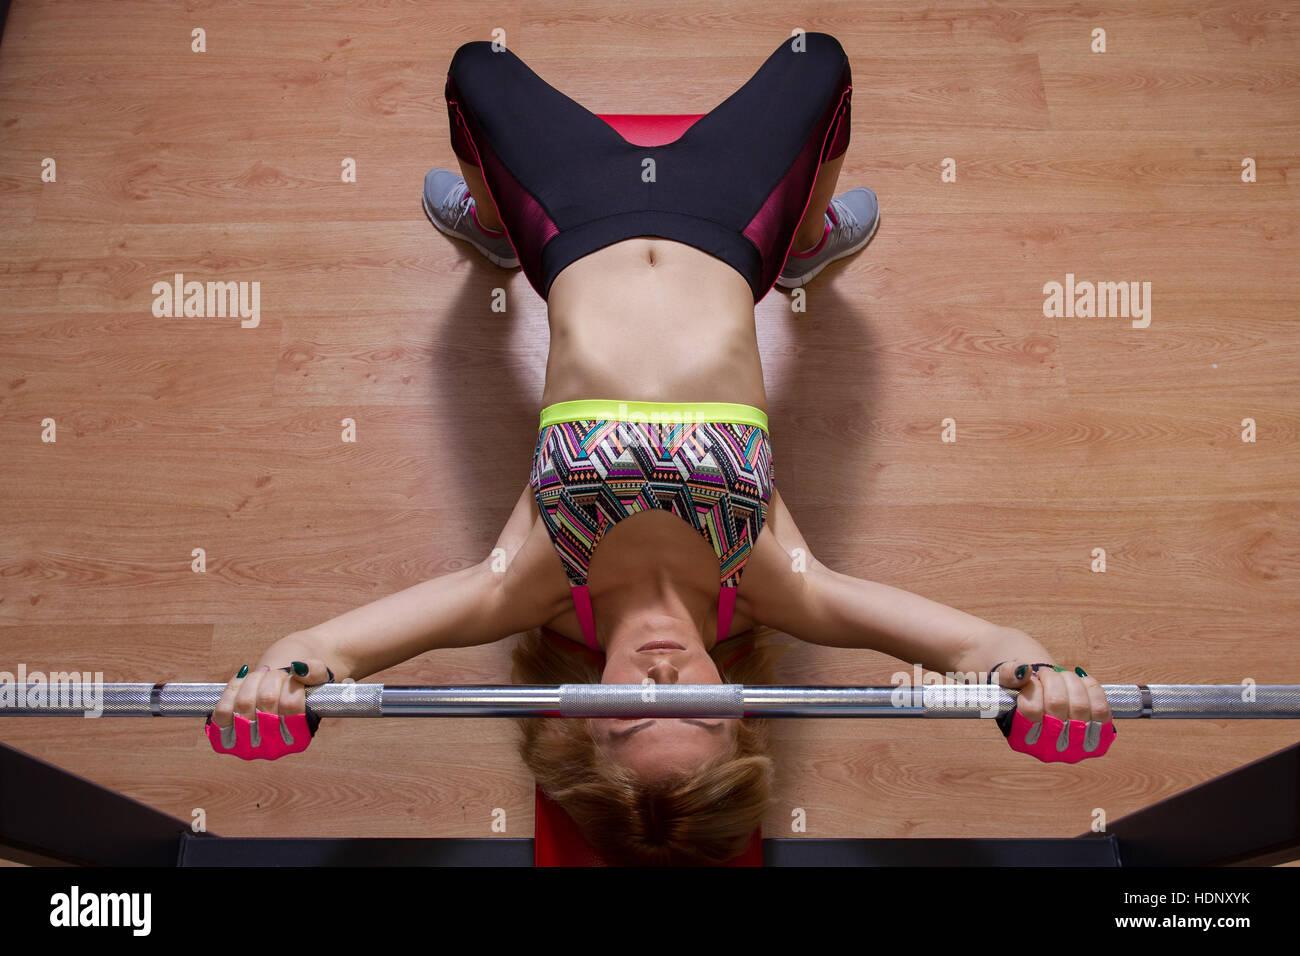 Entraînement sportif en salle de sport, fille blonde de la formation en salle de sport Photo Stock